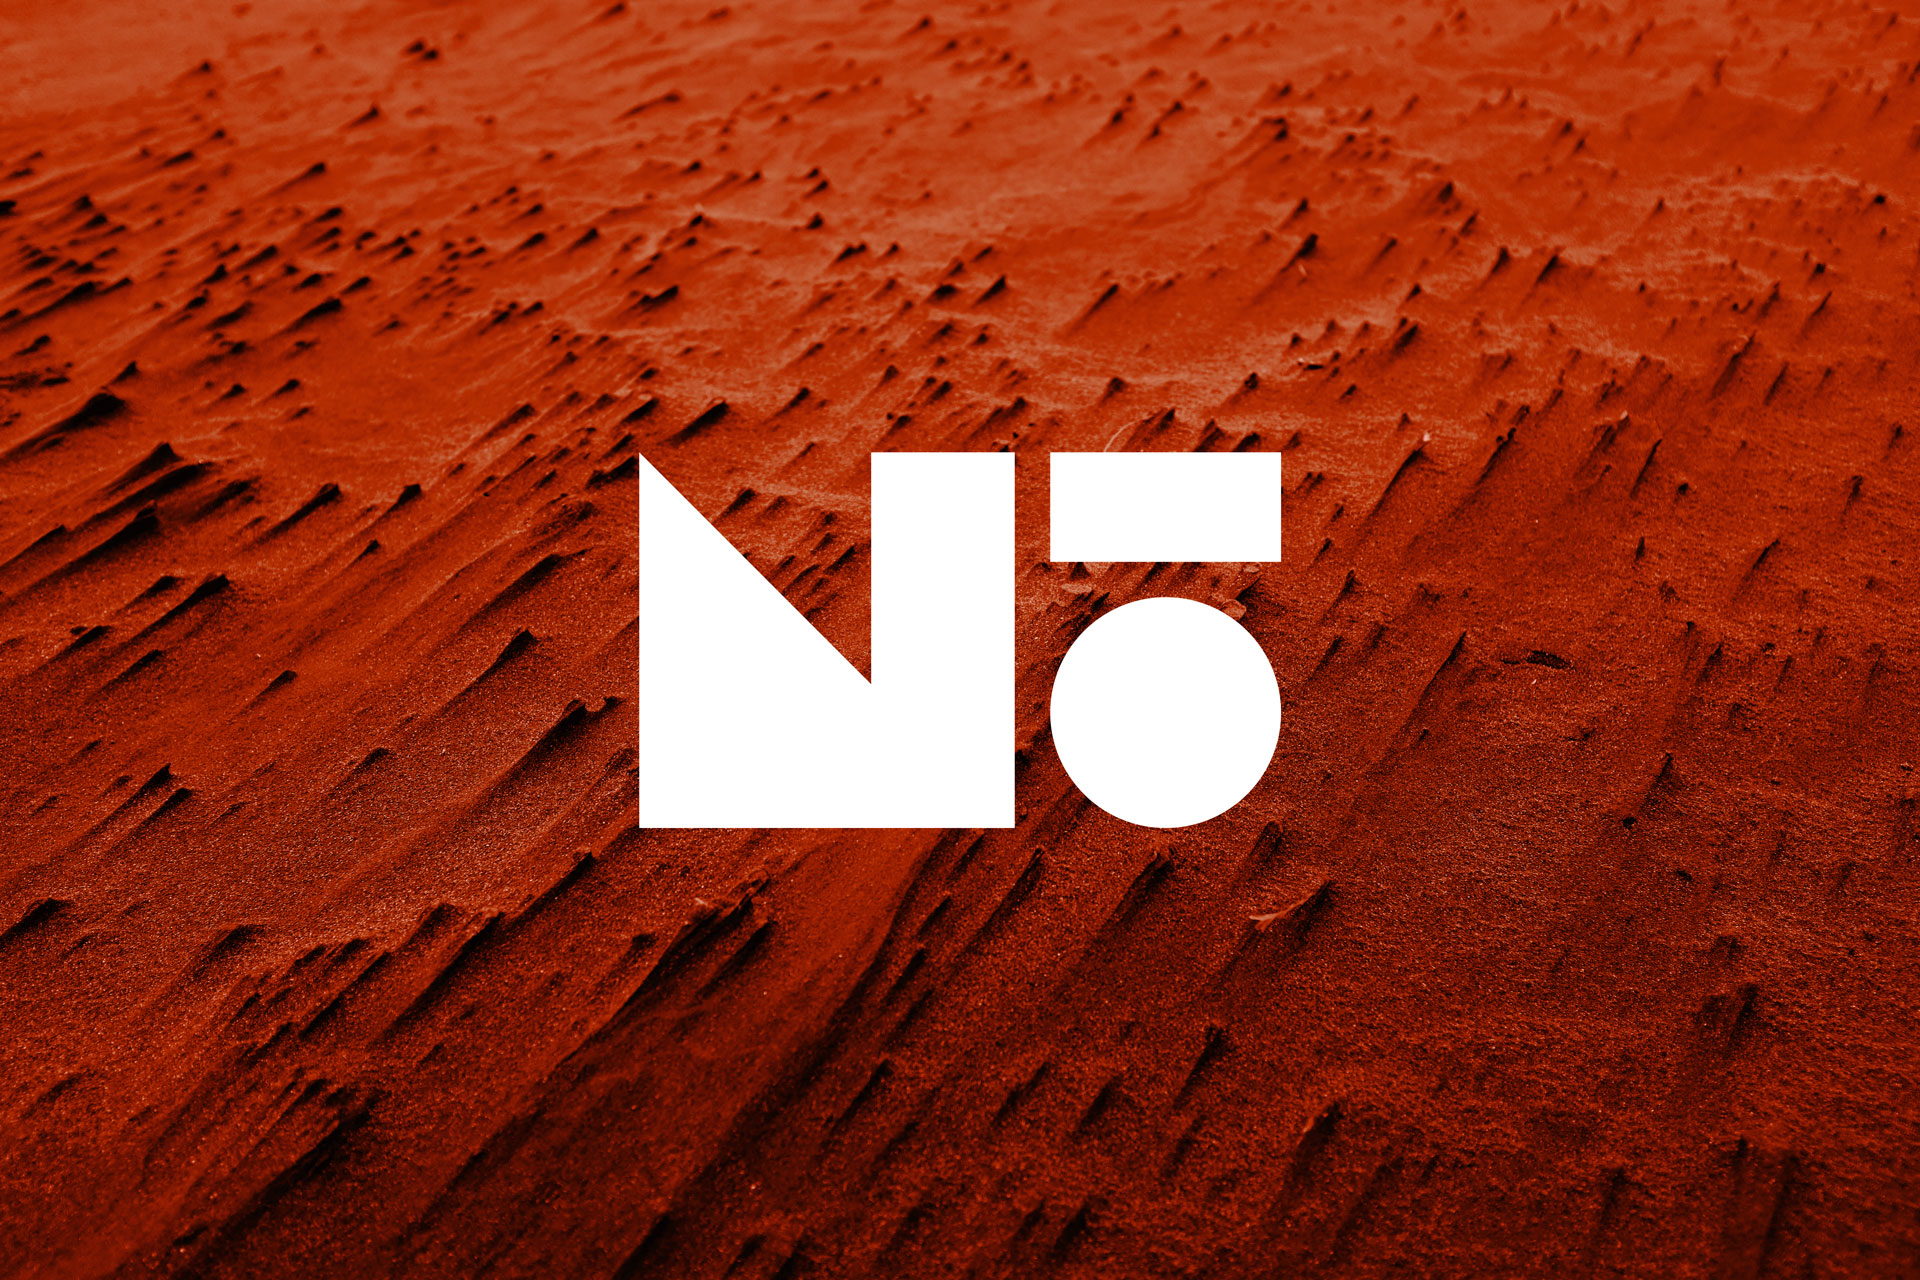 Home image novatail